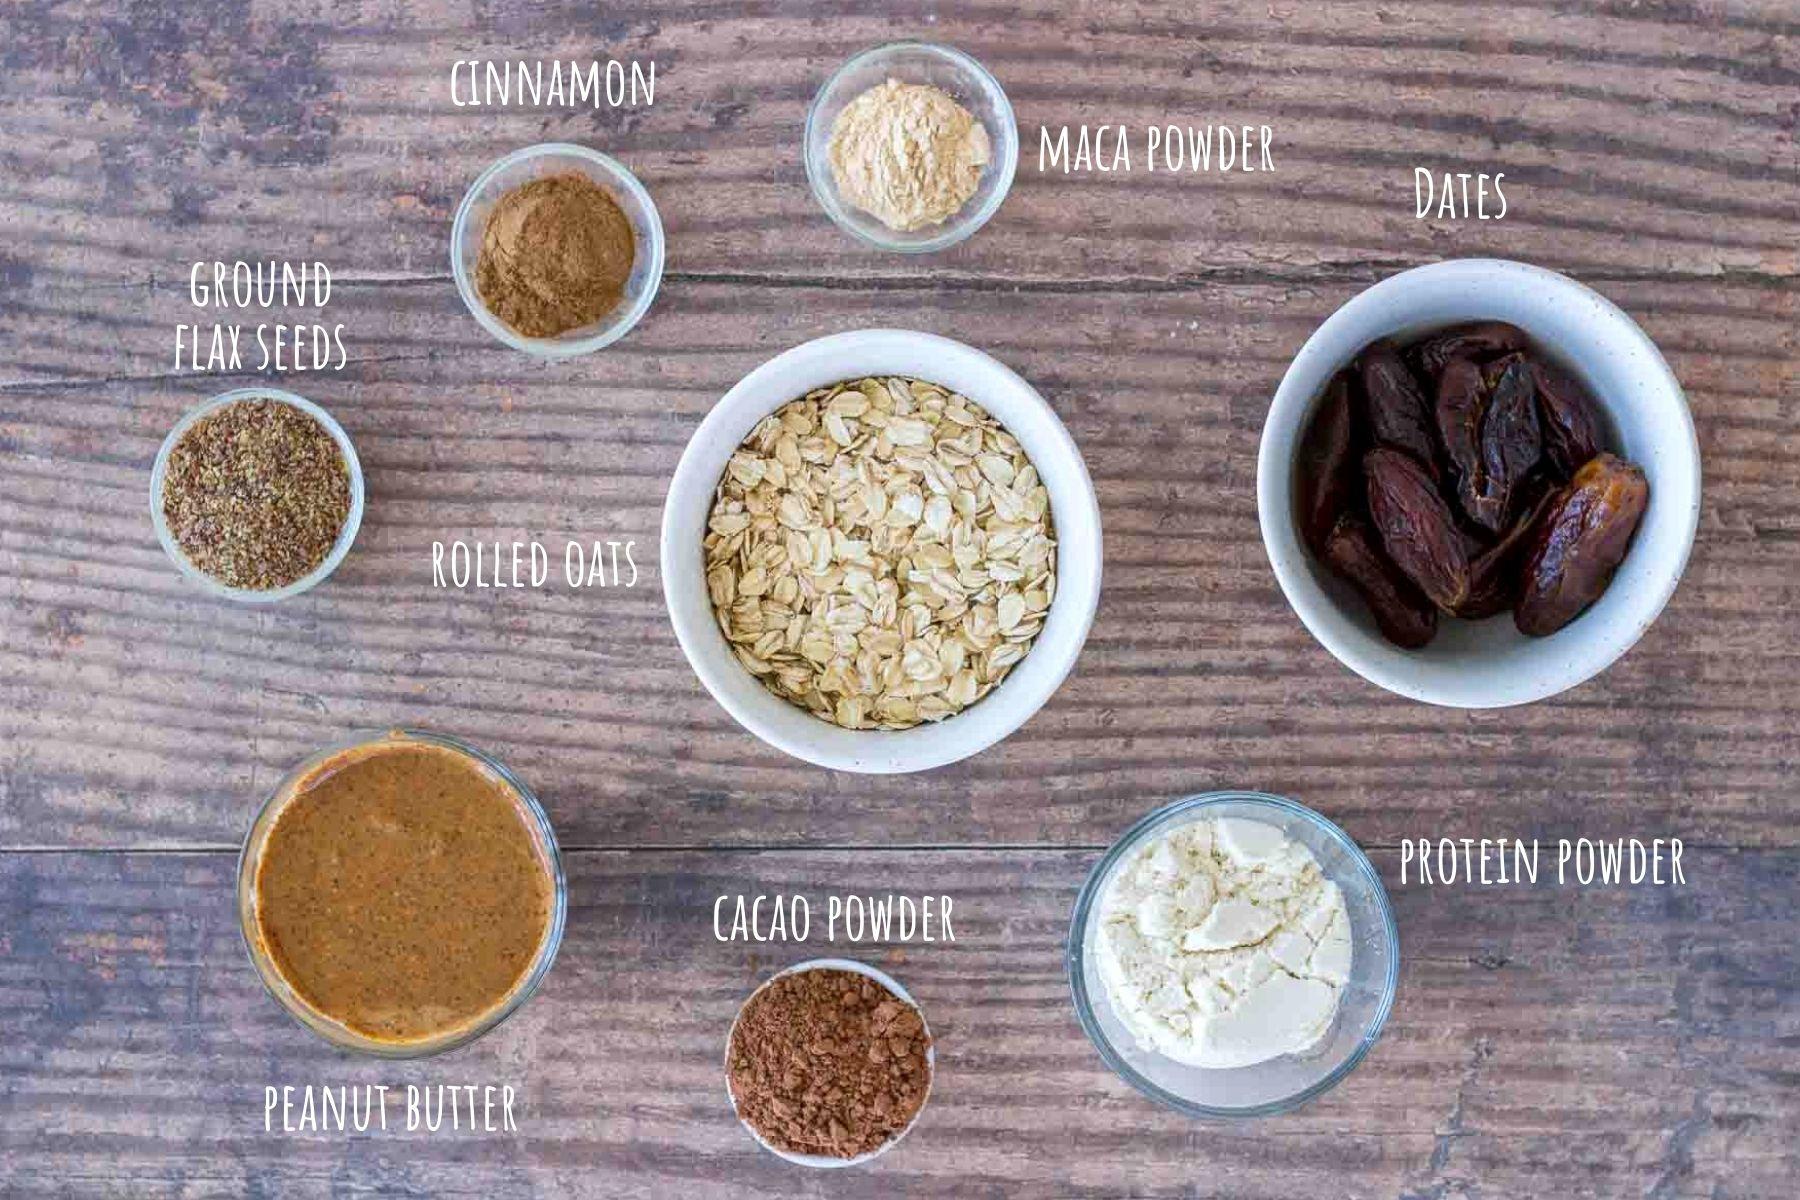 Chocolate Peanut Butter Protein Balls Ingredients